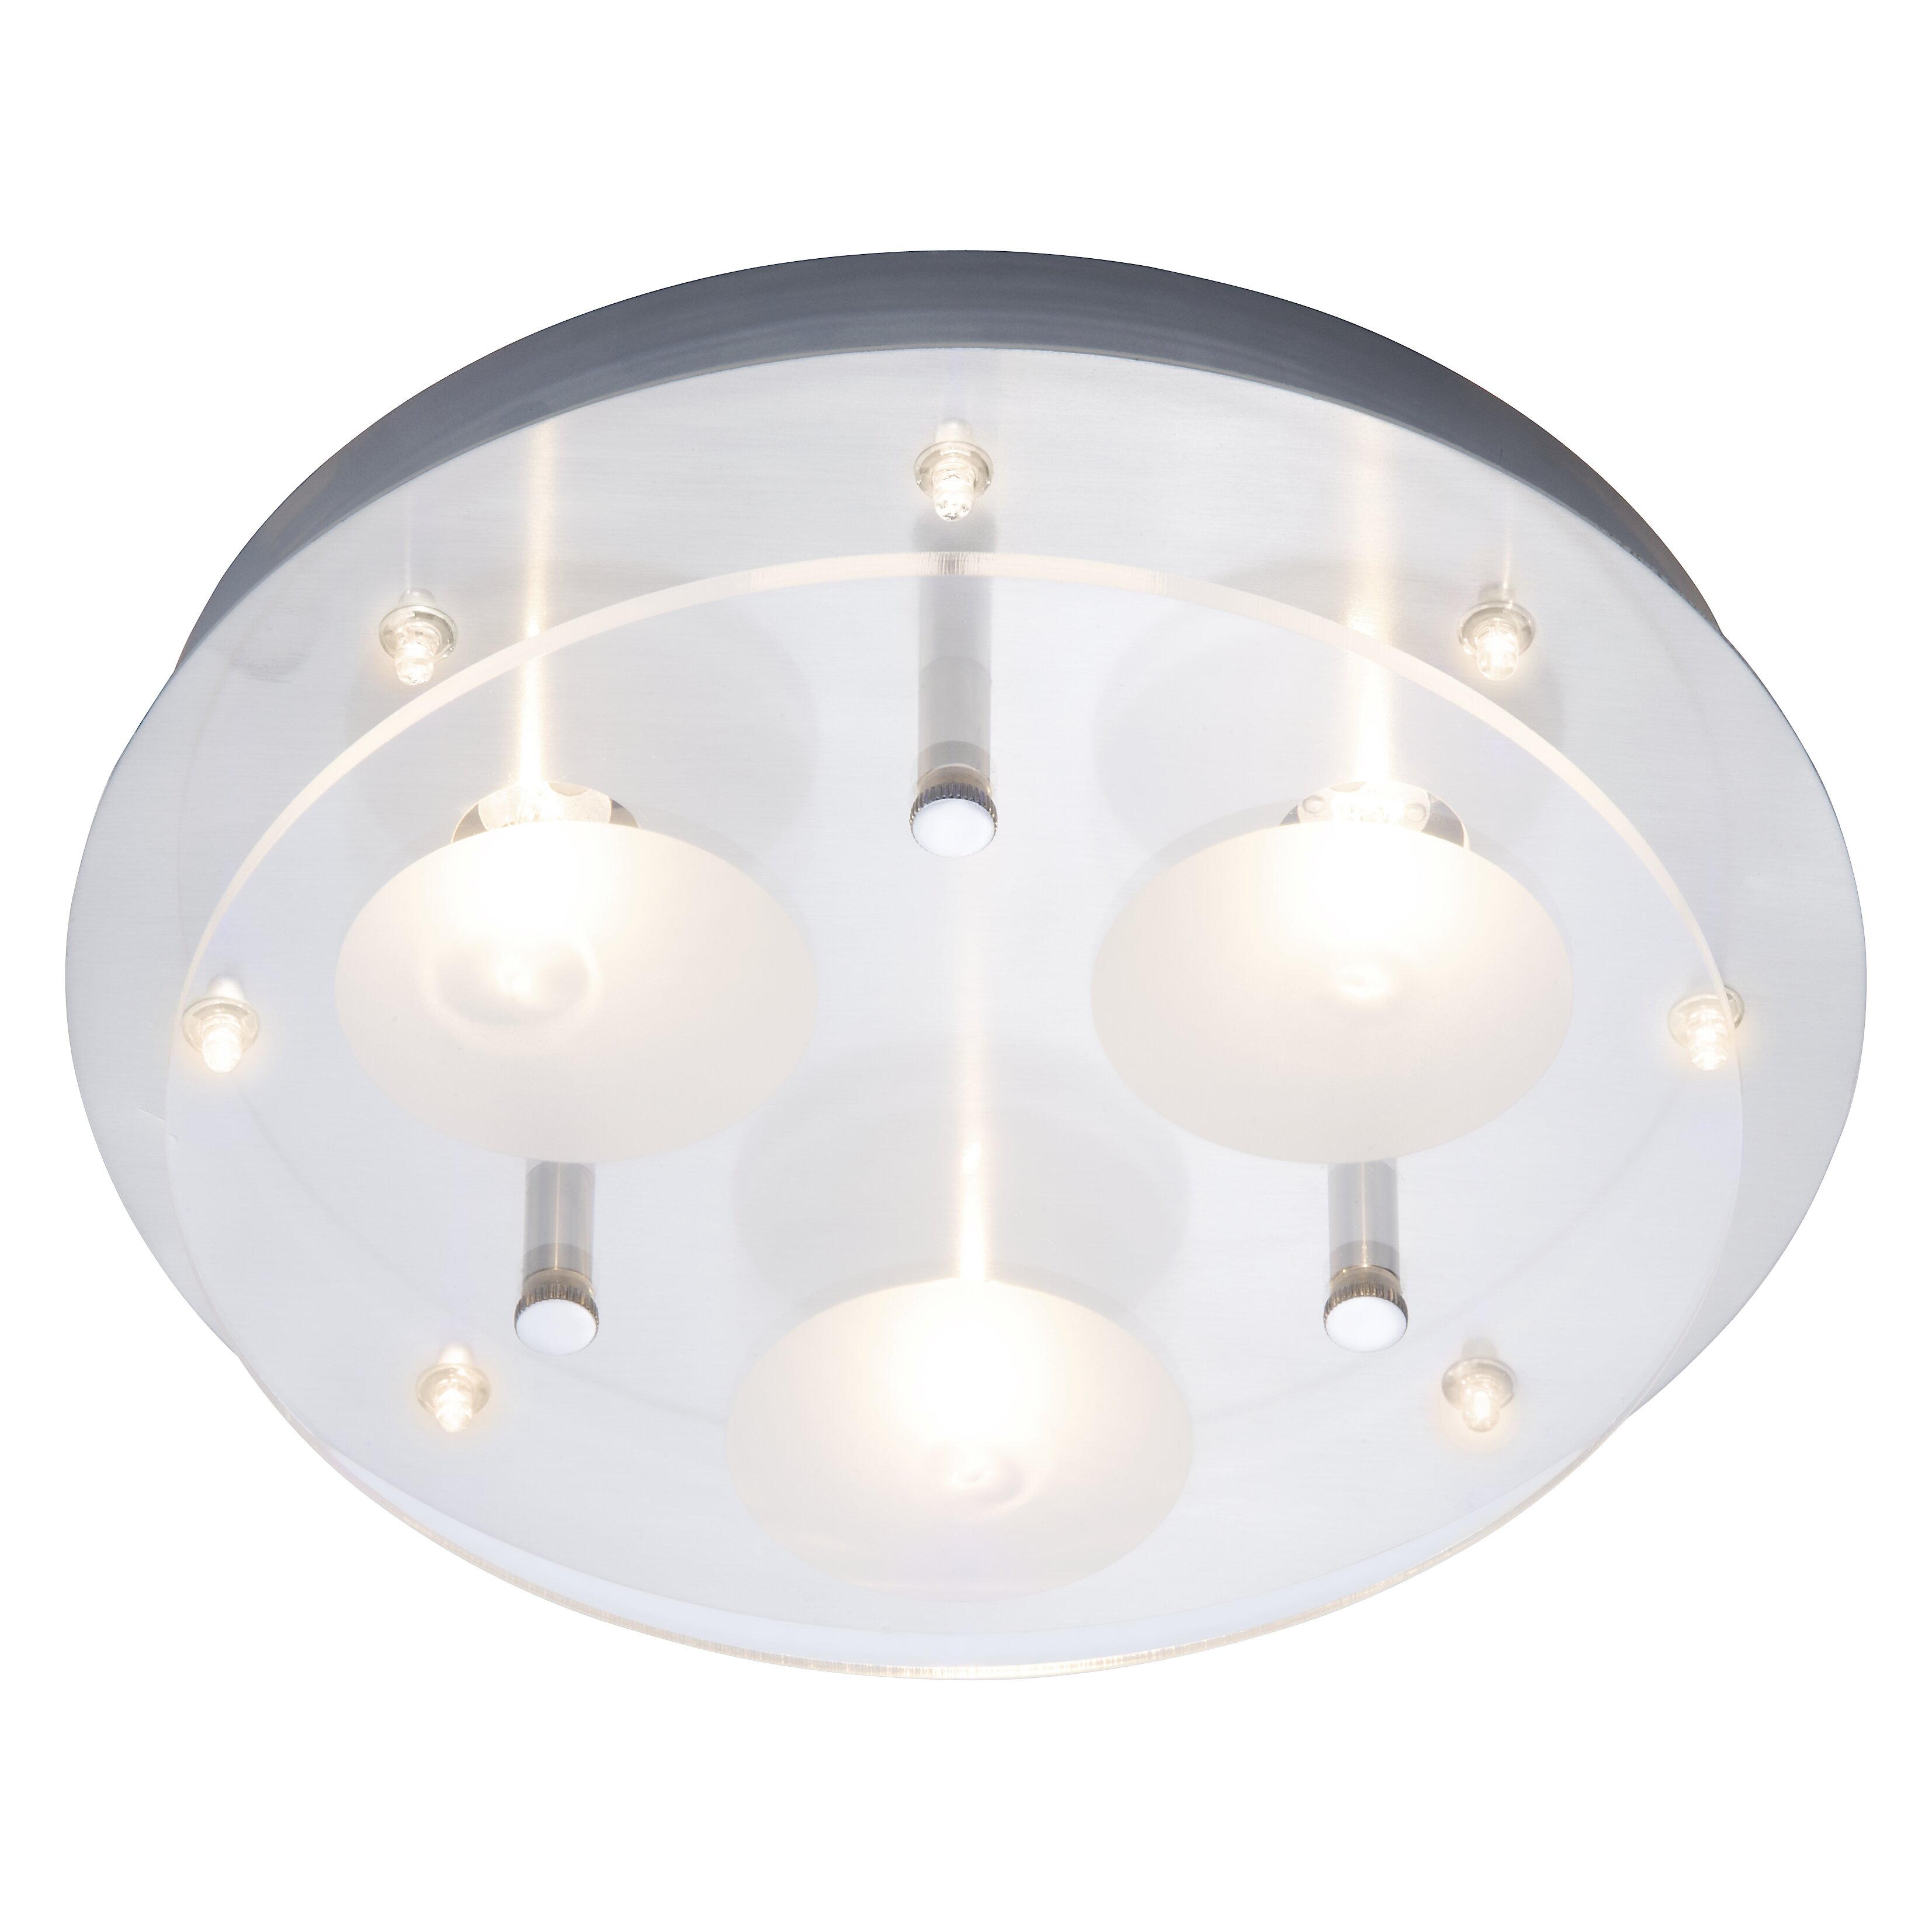 brilliant stars 3 light semi flush ceiling light wayfair uk. Black Bedroom Furniture Sets. Home Design Ideas